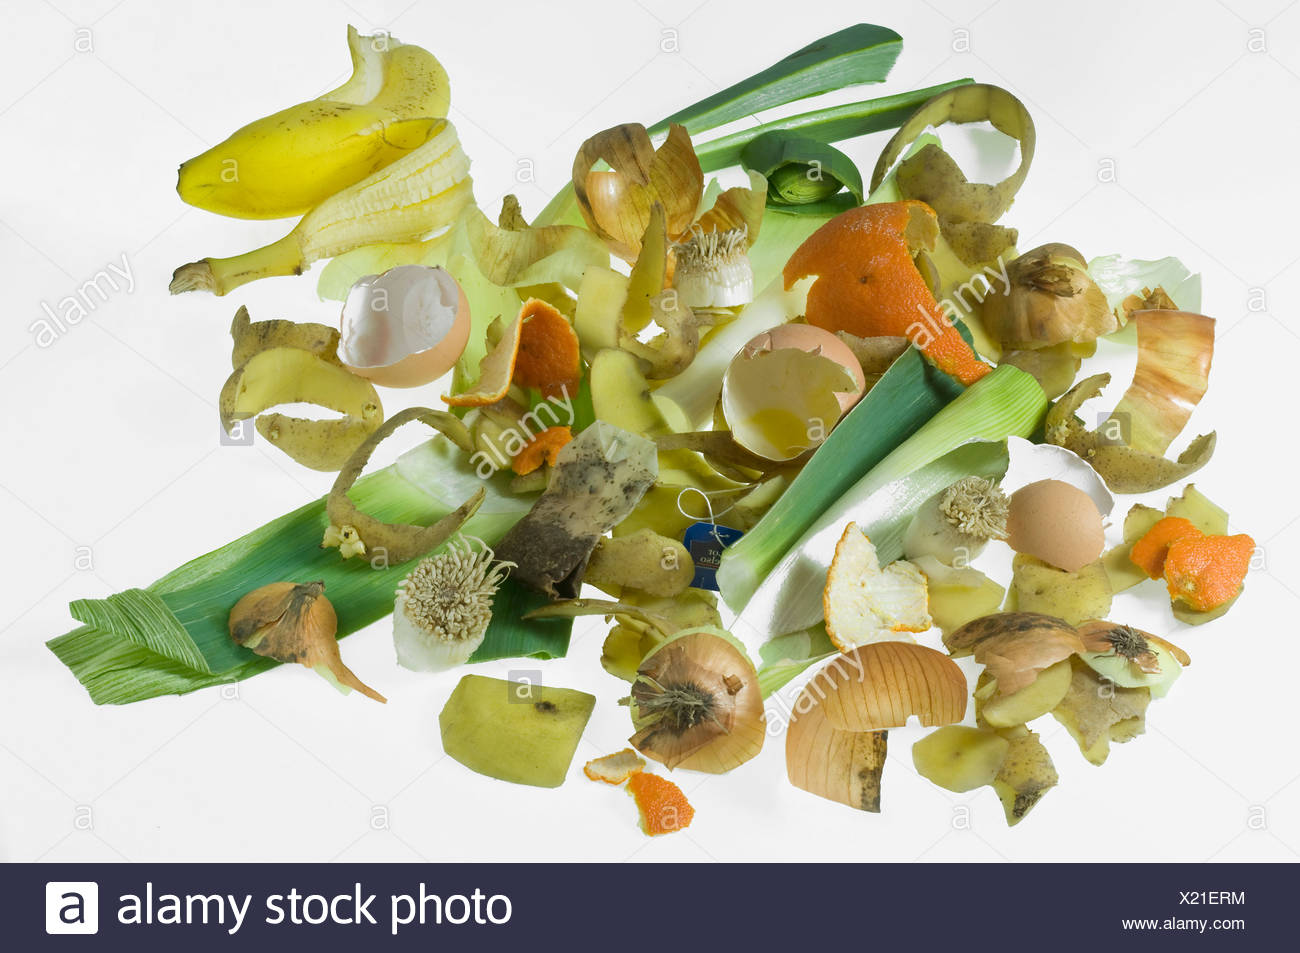 Organic waste - Stock Image